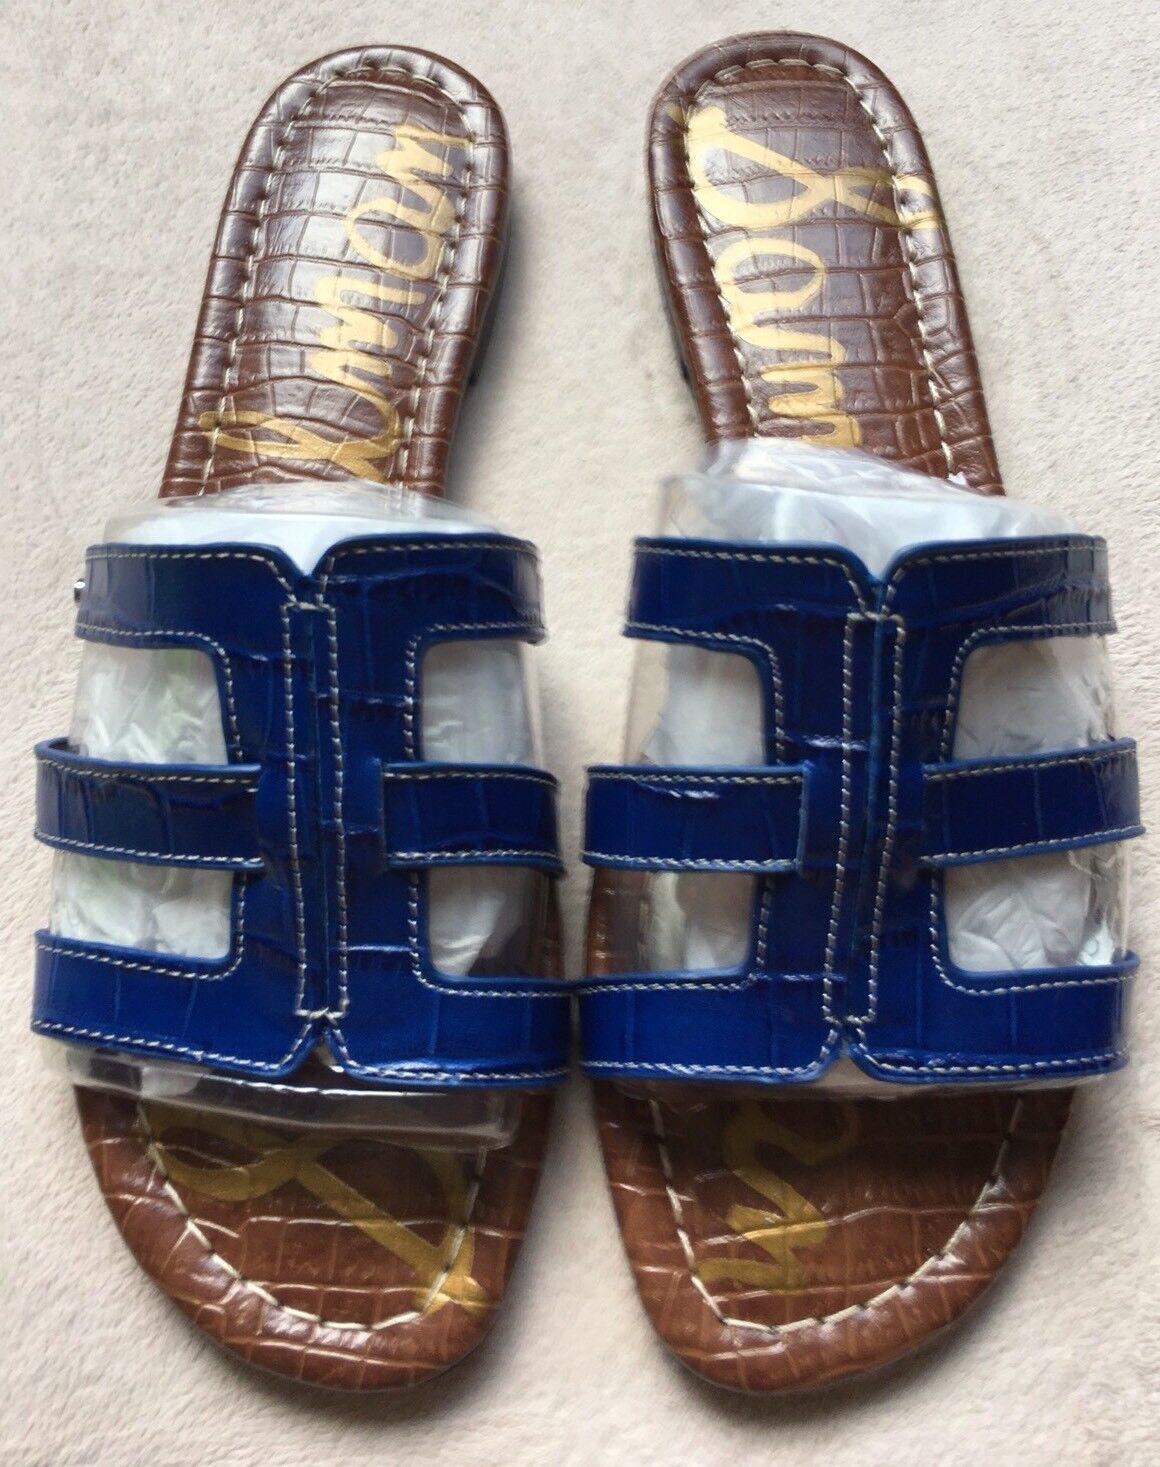 Sam Edelman Berit Strappy Croc-Embossed Flat Slide Sandale, Sz 10, Navy Blau NEU